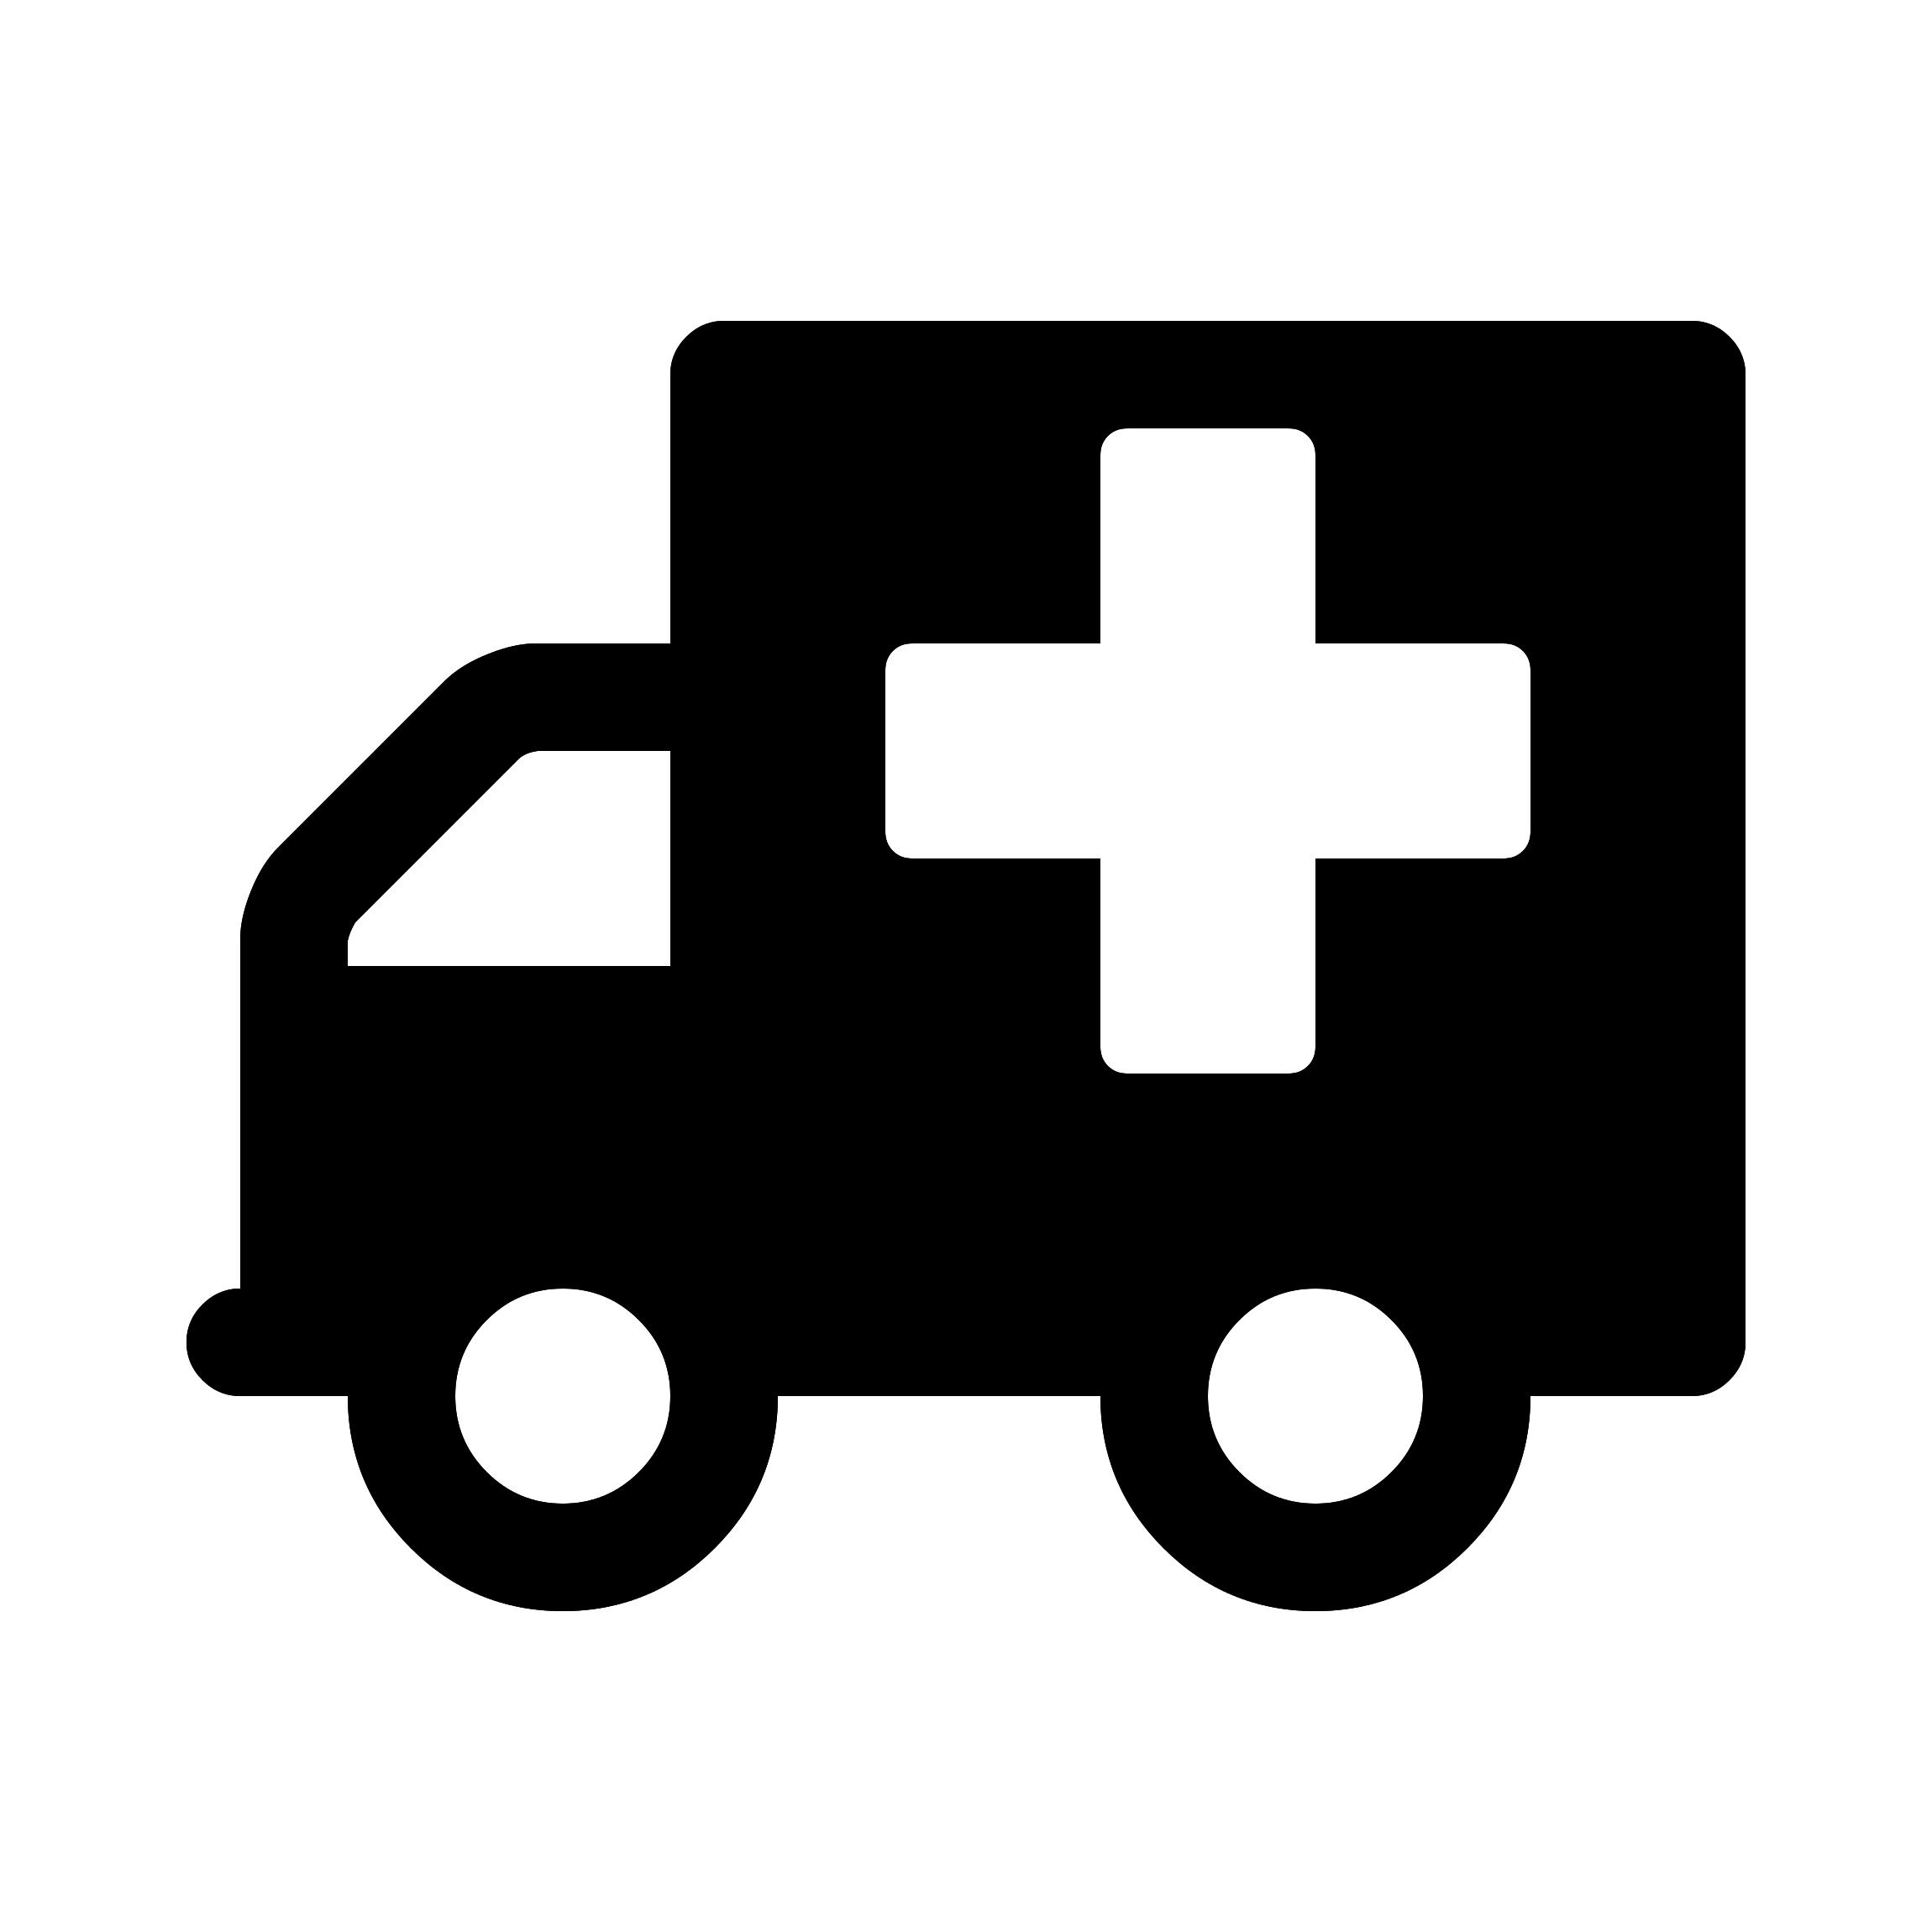 data/images/ambulance.png